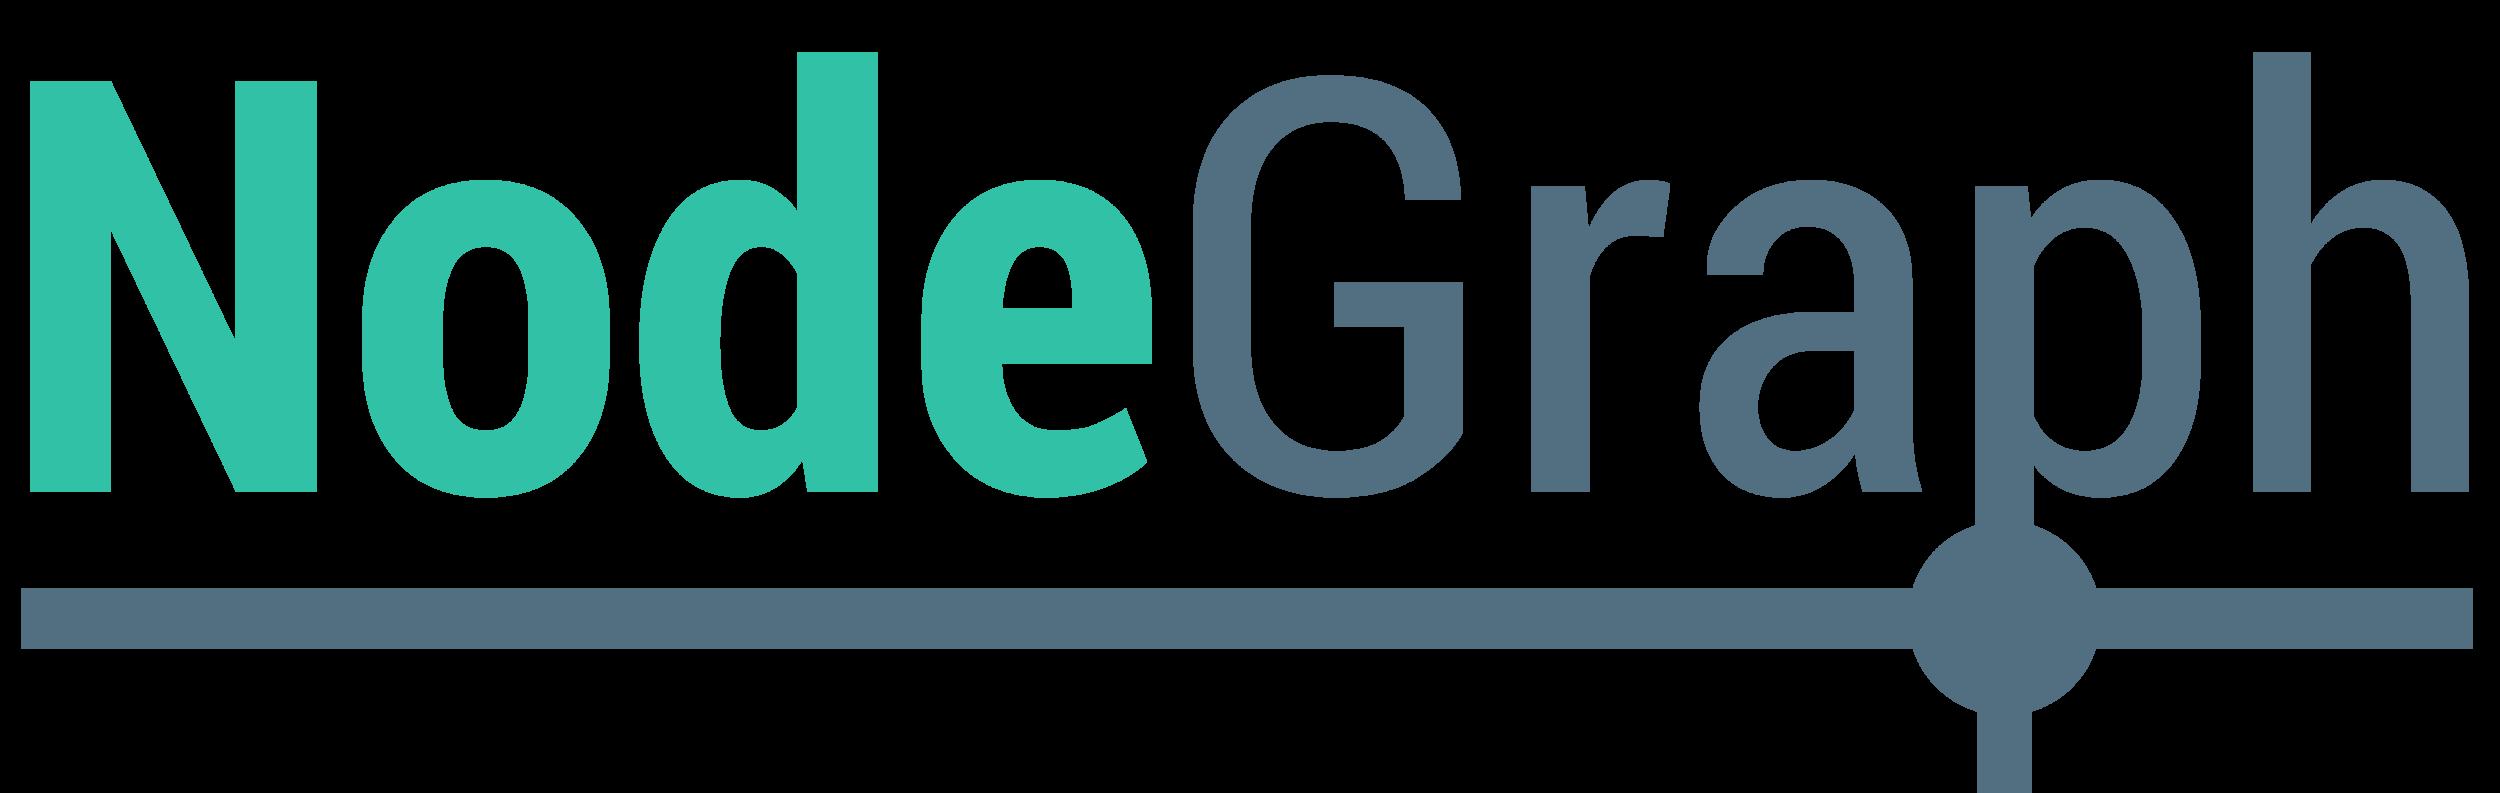 nodegrapgh_logo.png